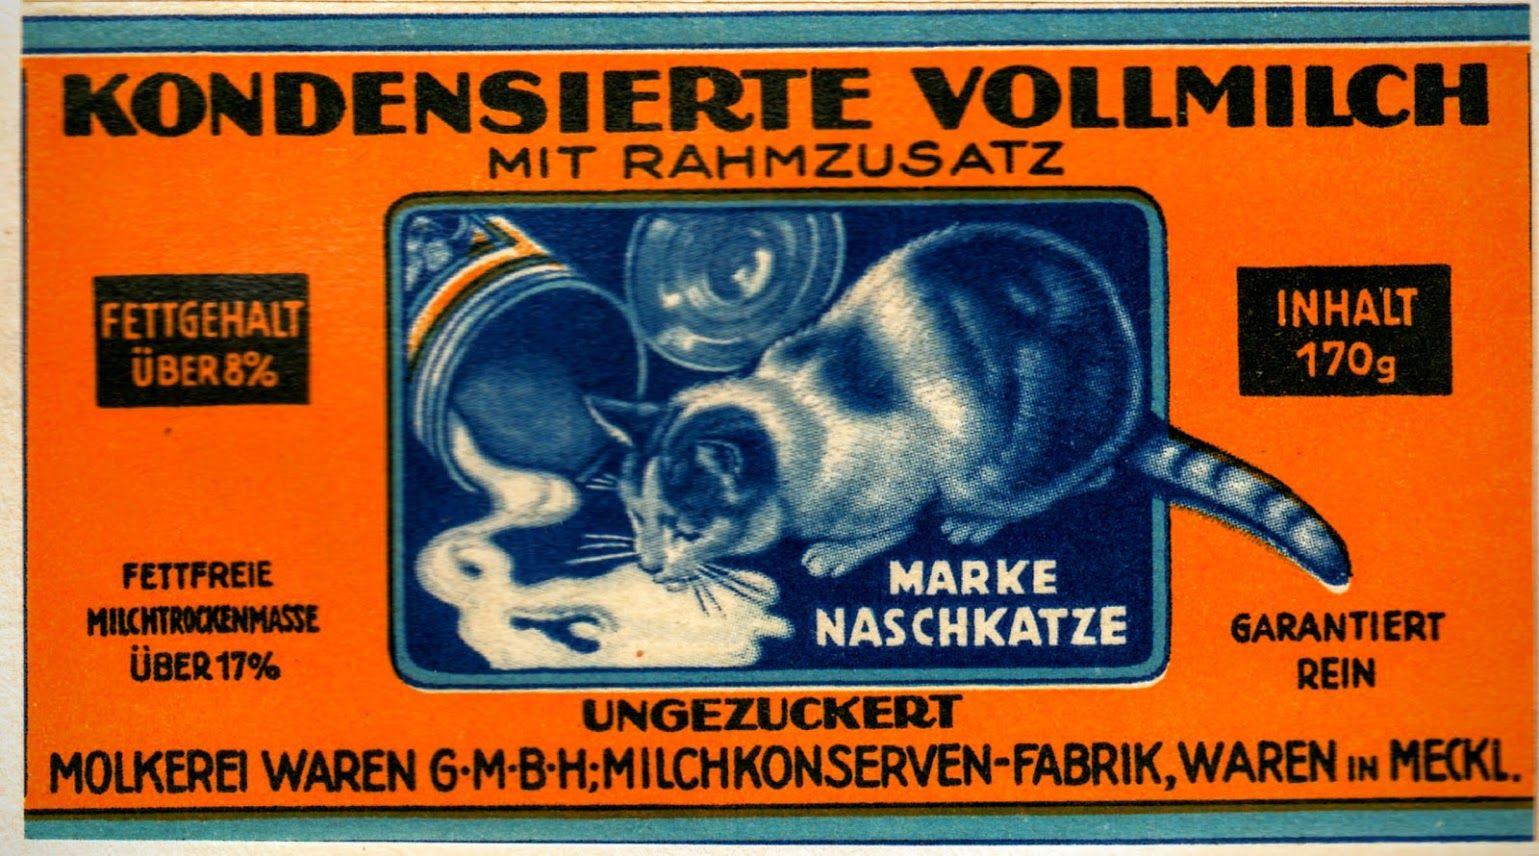 Katzen, Cat, Werbung, Advertising, Ad - Waren / Müritz, Mecklenburg, Germany, 1931